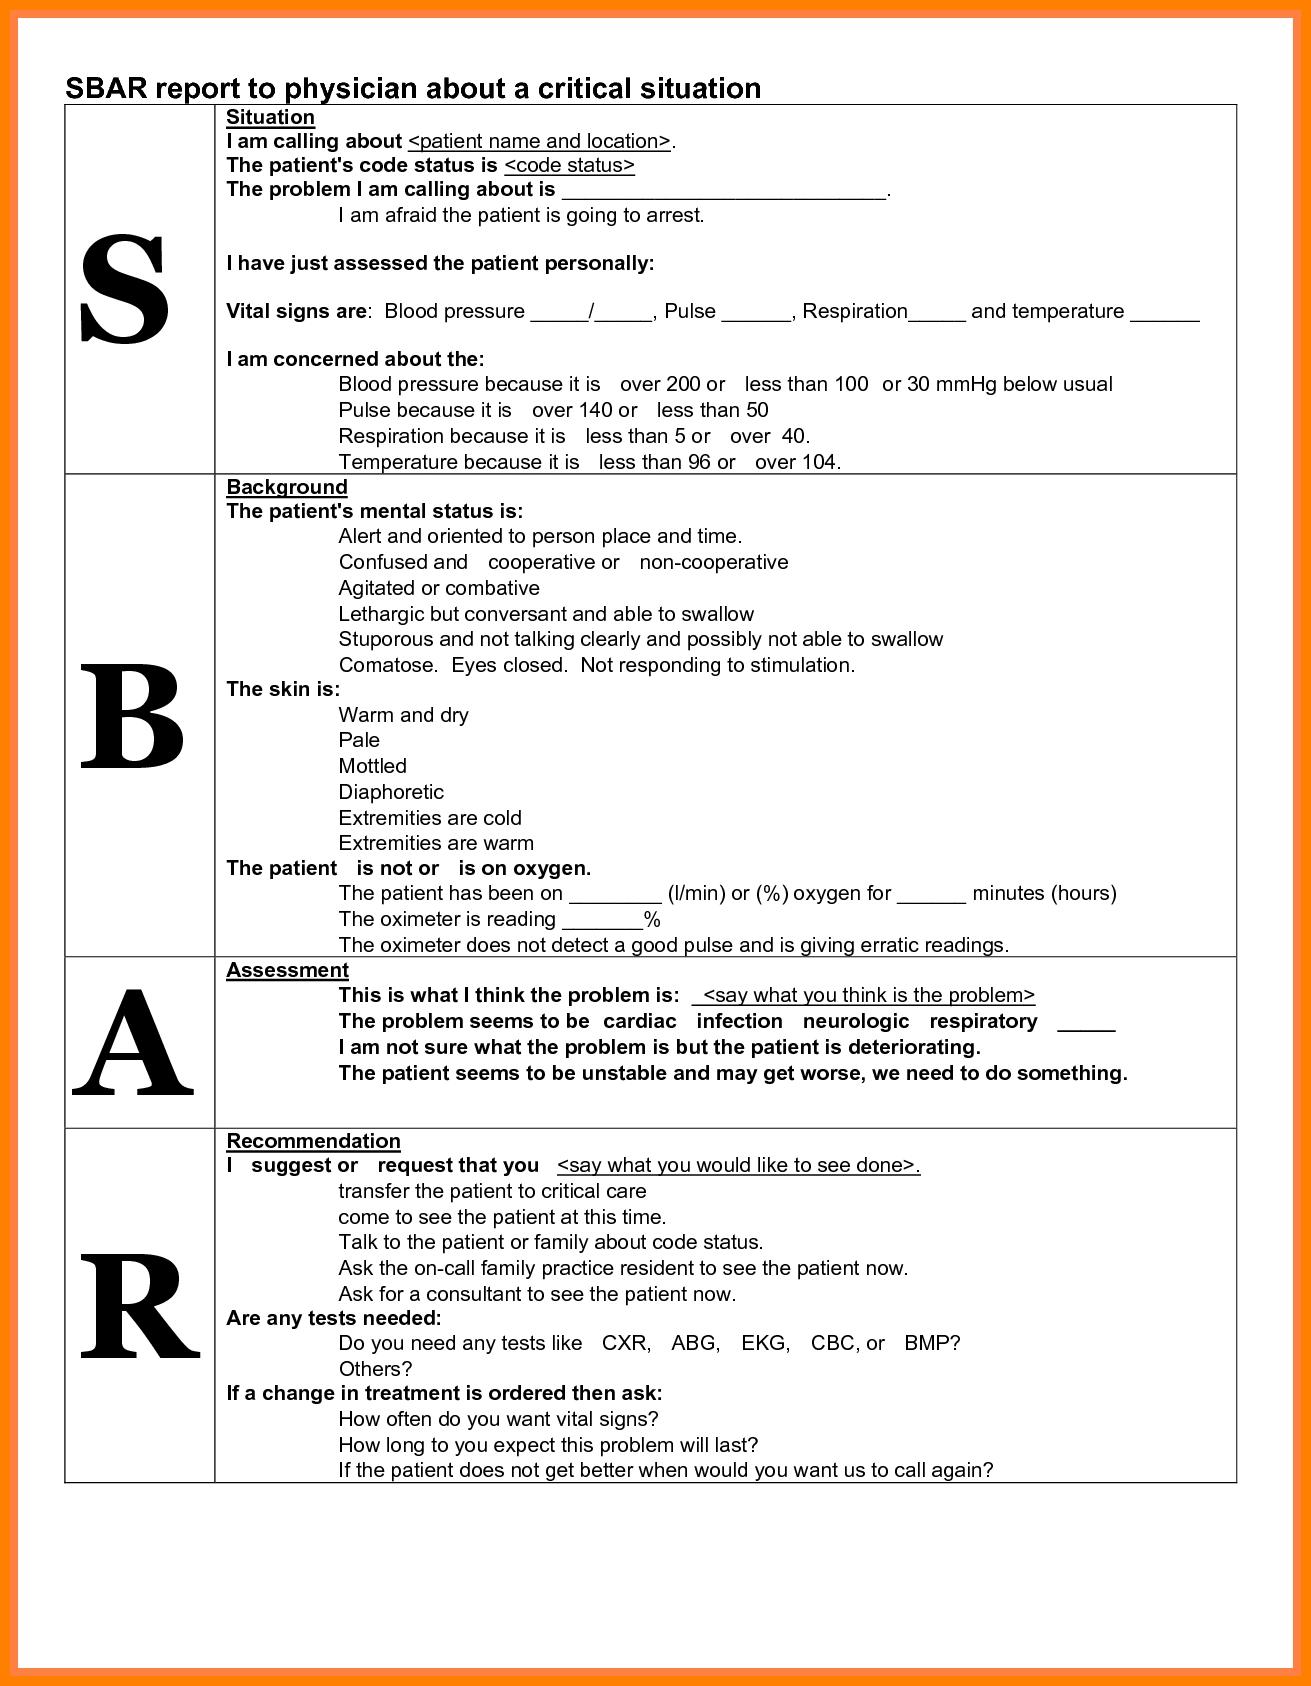 sbar examples nurse to doctor  sbar format - Google Search | Sbar nursing, Sbar, Charting ..